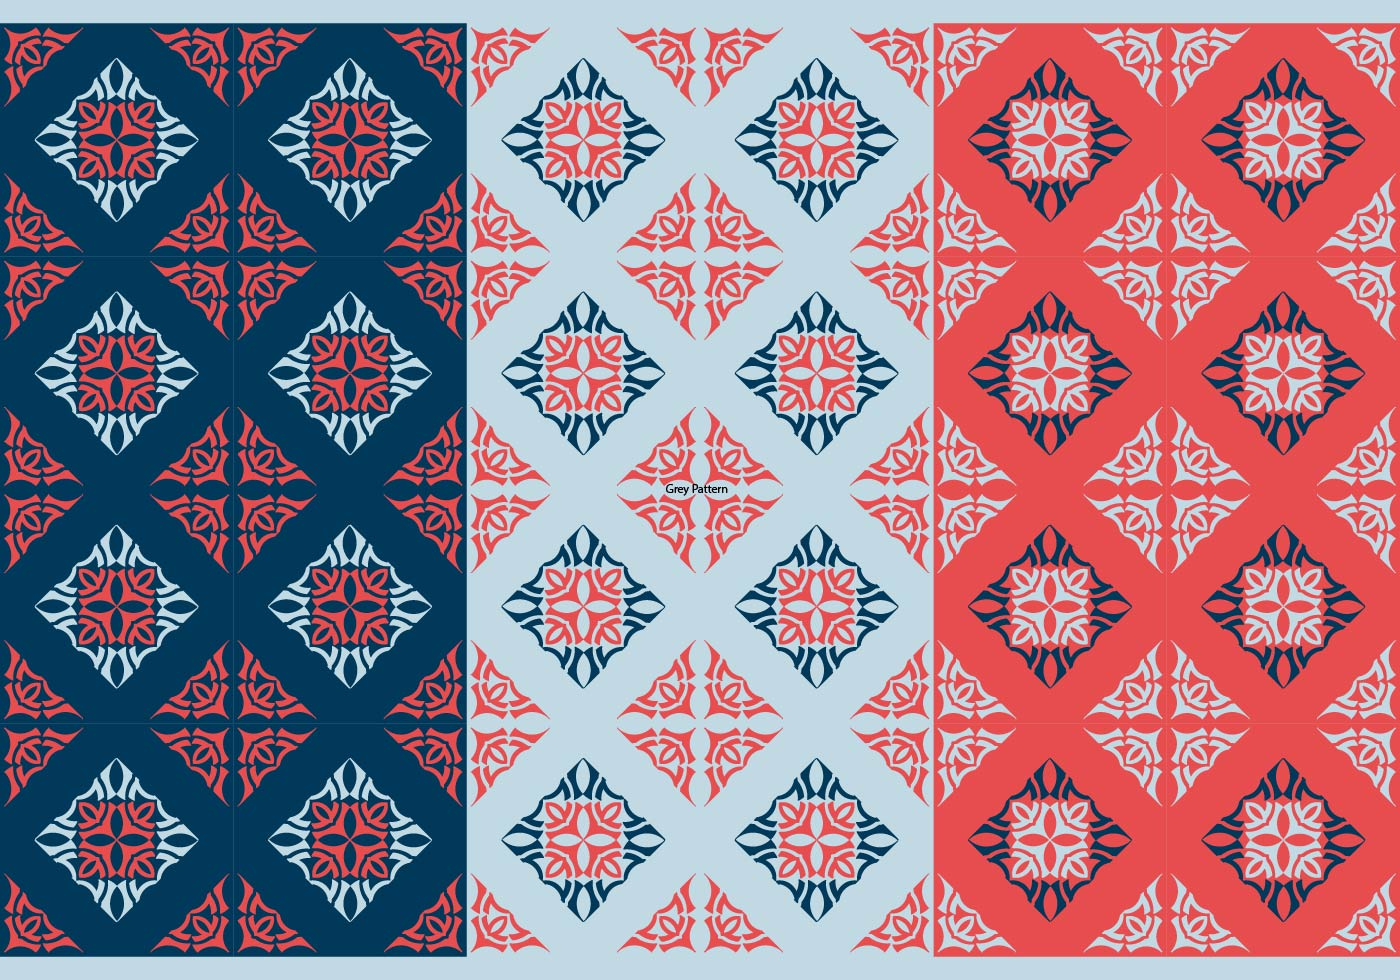 Free Thai Seamless Vector Patterns, Vol. I